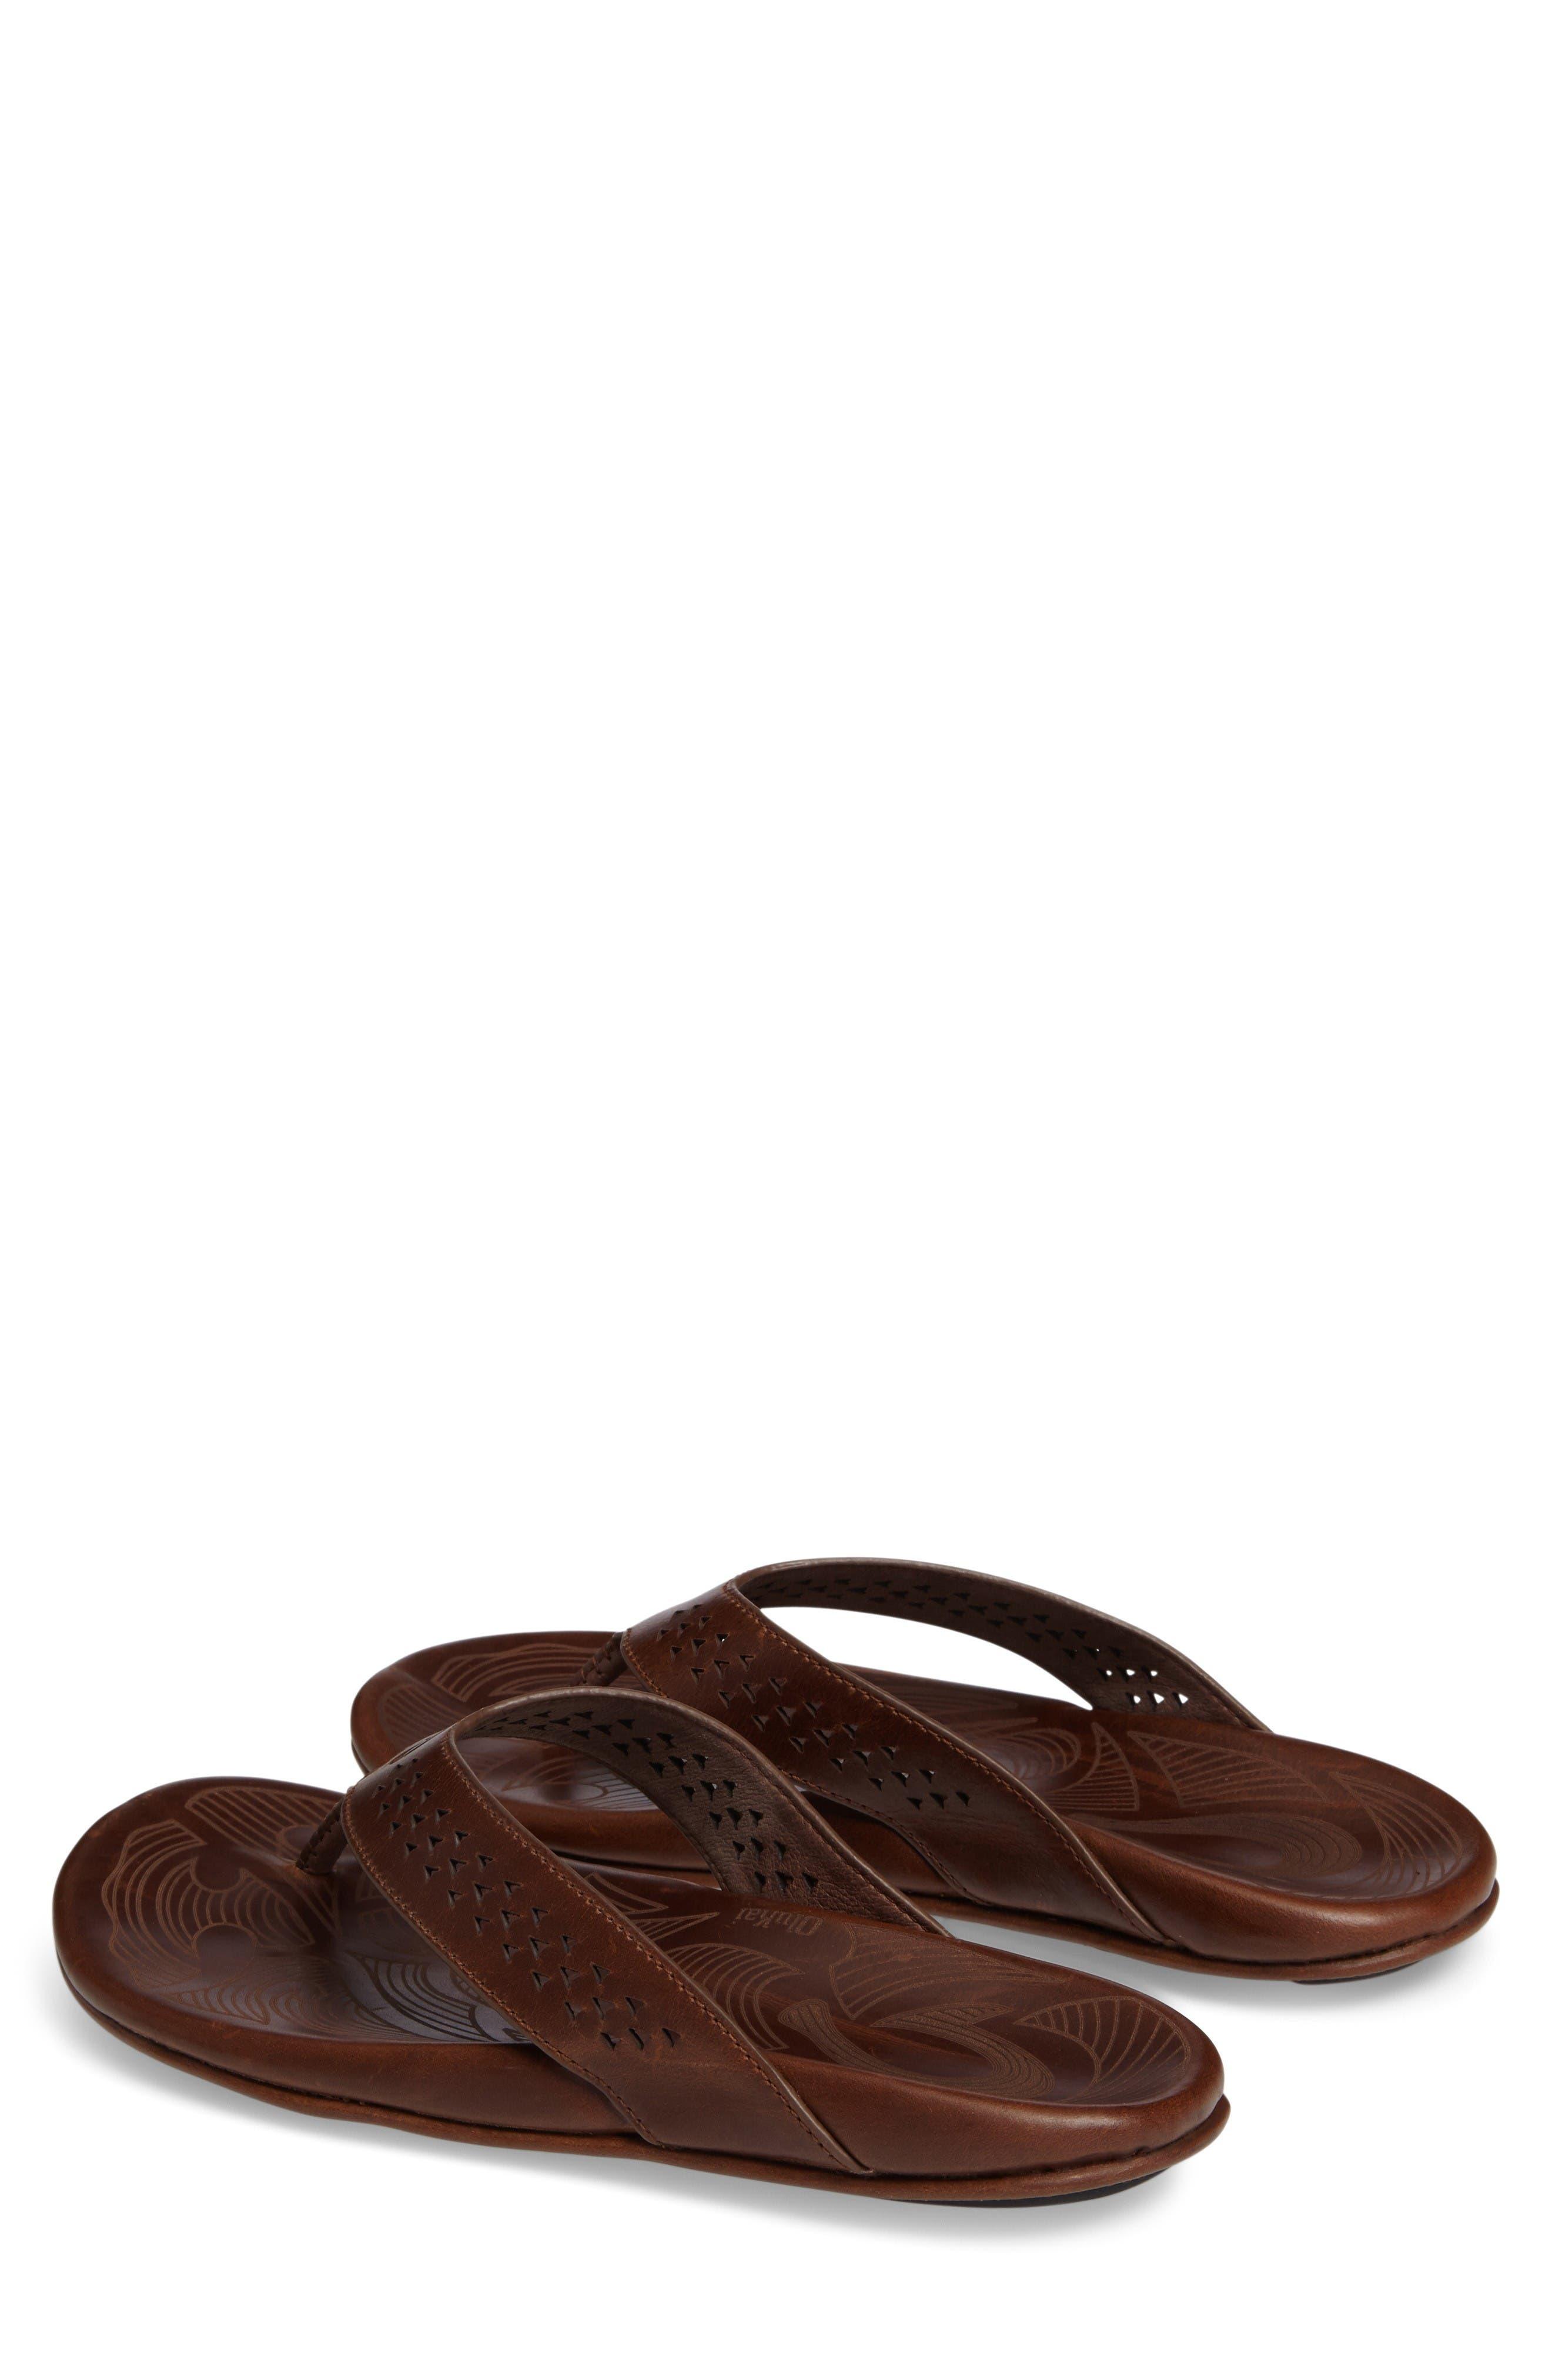 Kohana Flip Flop,                             Alternate thumbnail 3, color,                             Toffee/ Toffee Leather